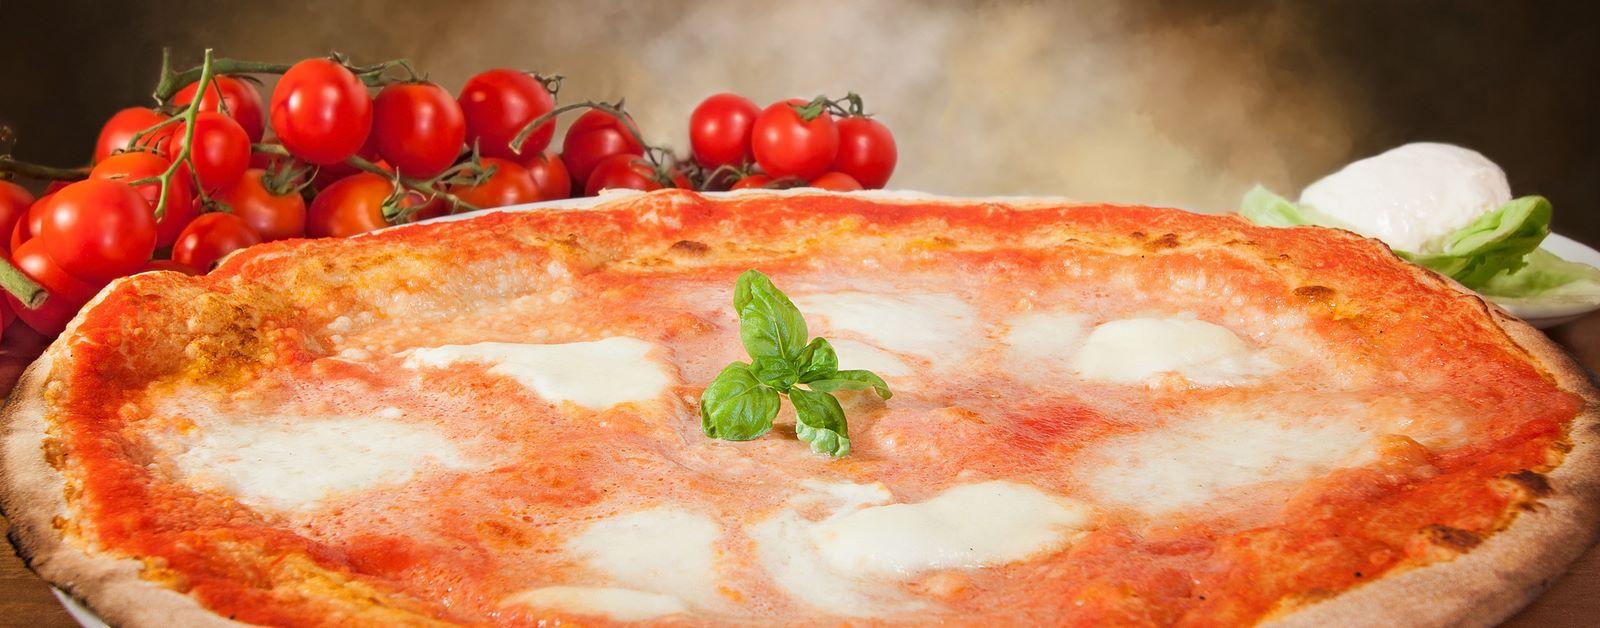 pizzeria napoletana Cetara Salerno